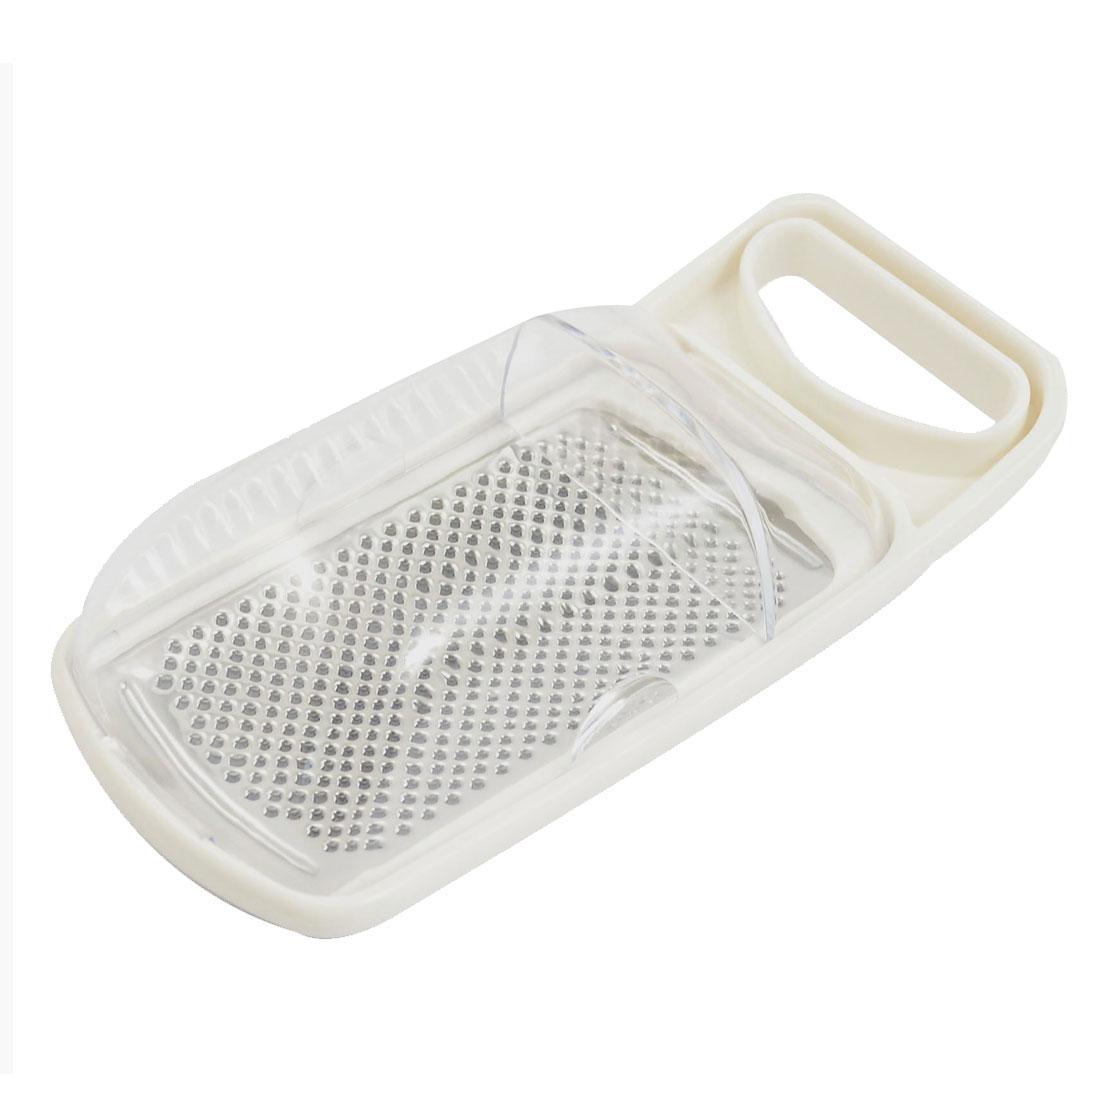 Kitchenware Plastic Grip Fruit Vegetable Grater Peeler Slicer Tool